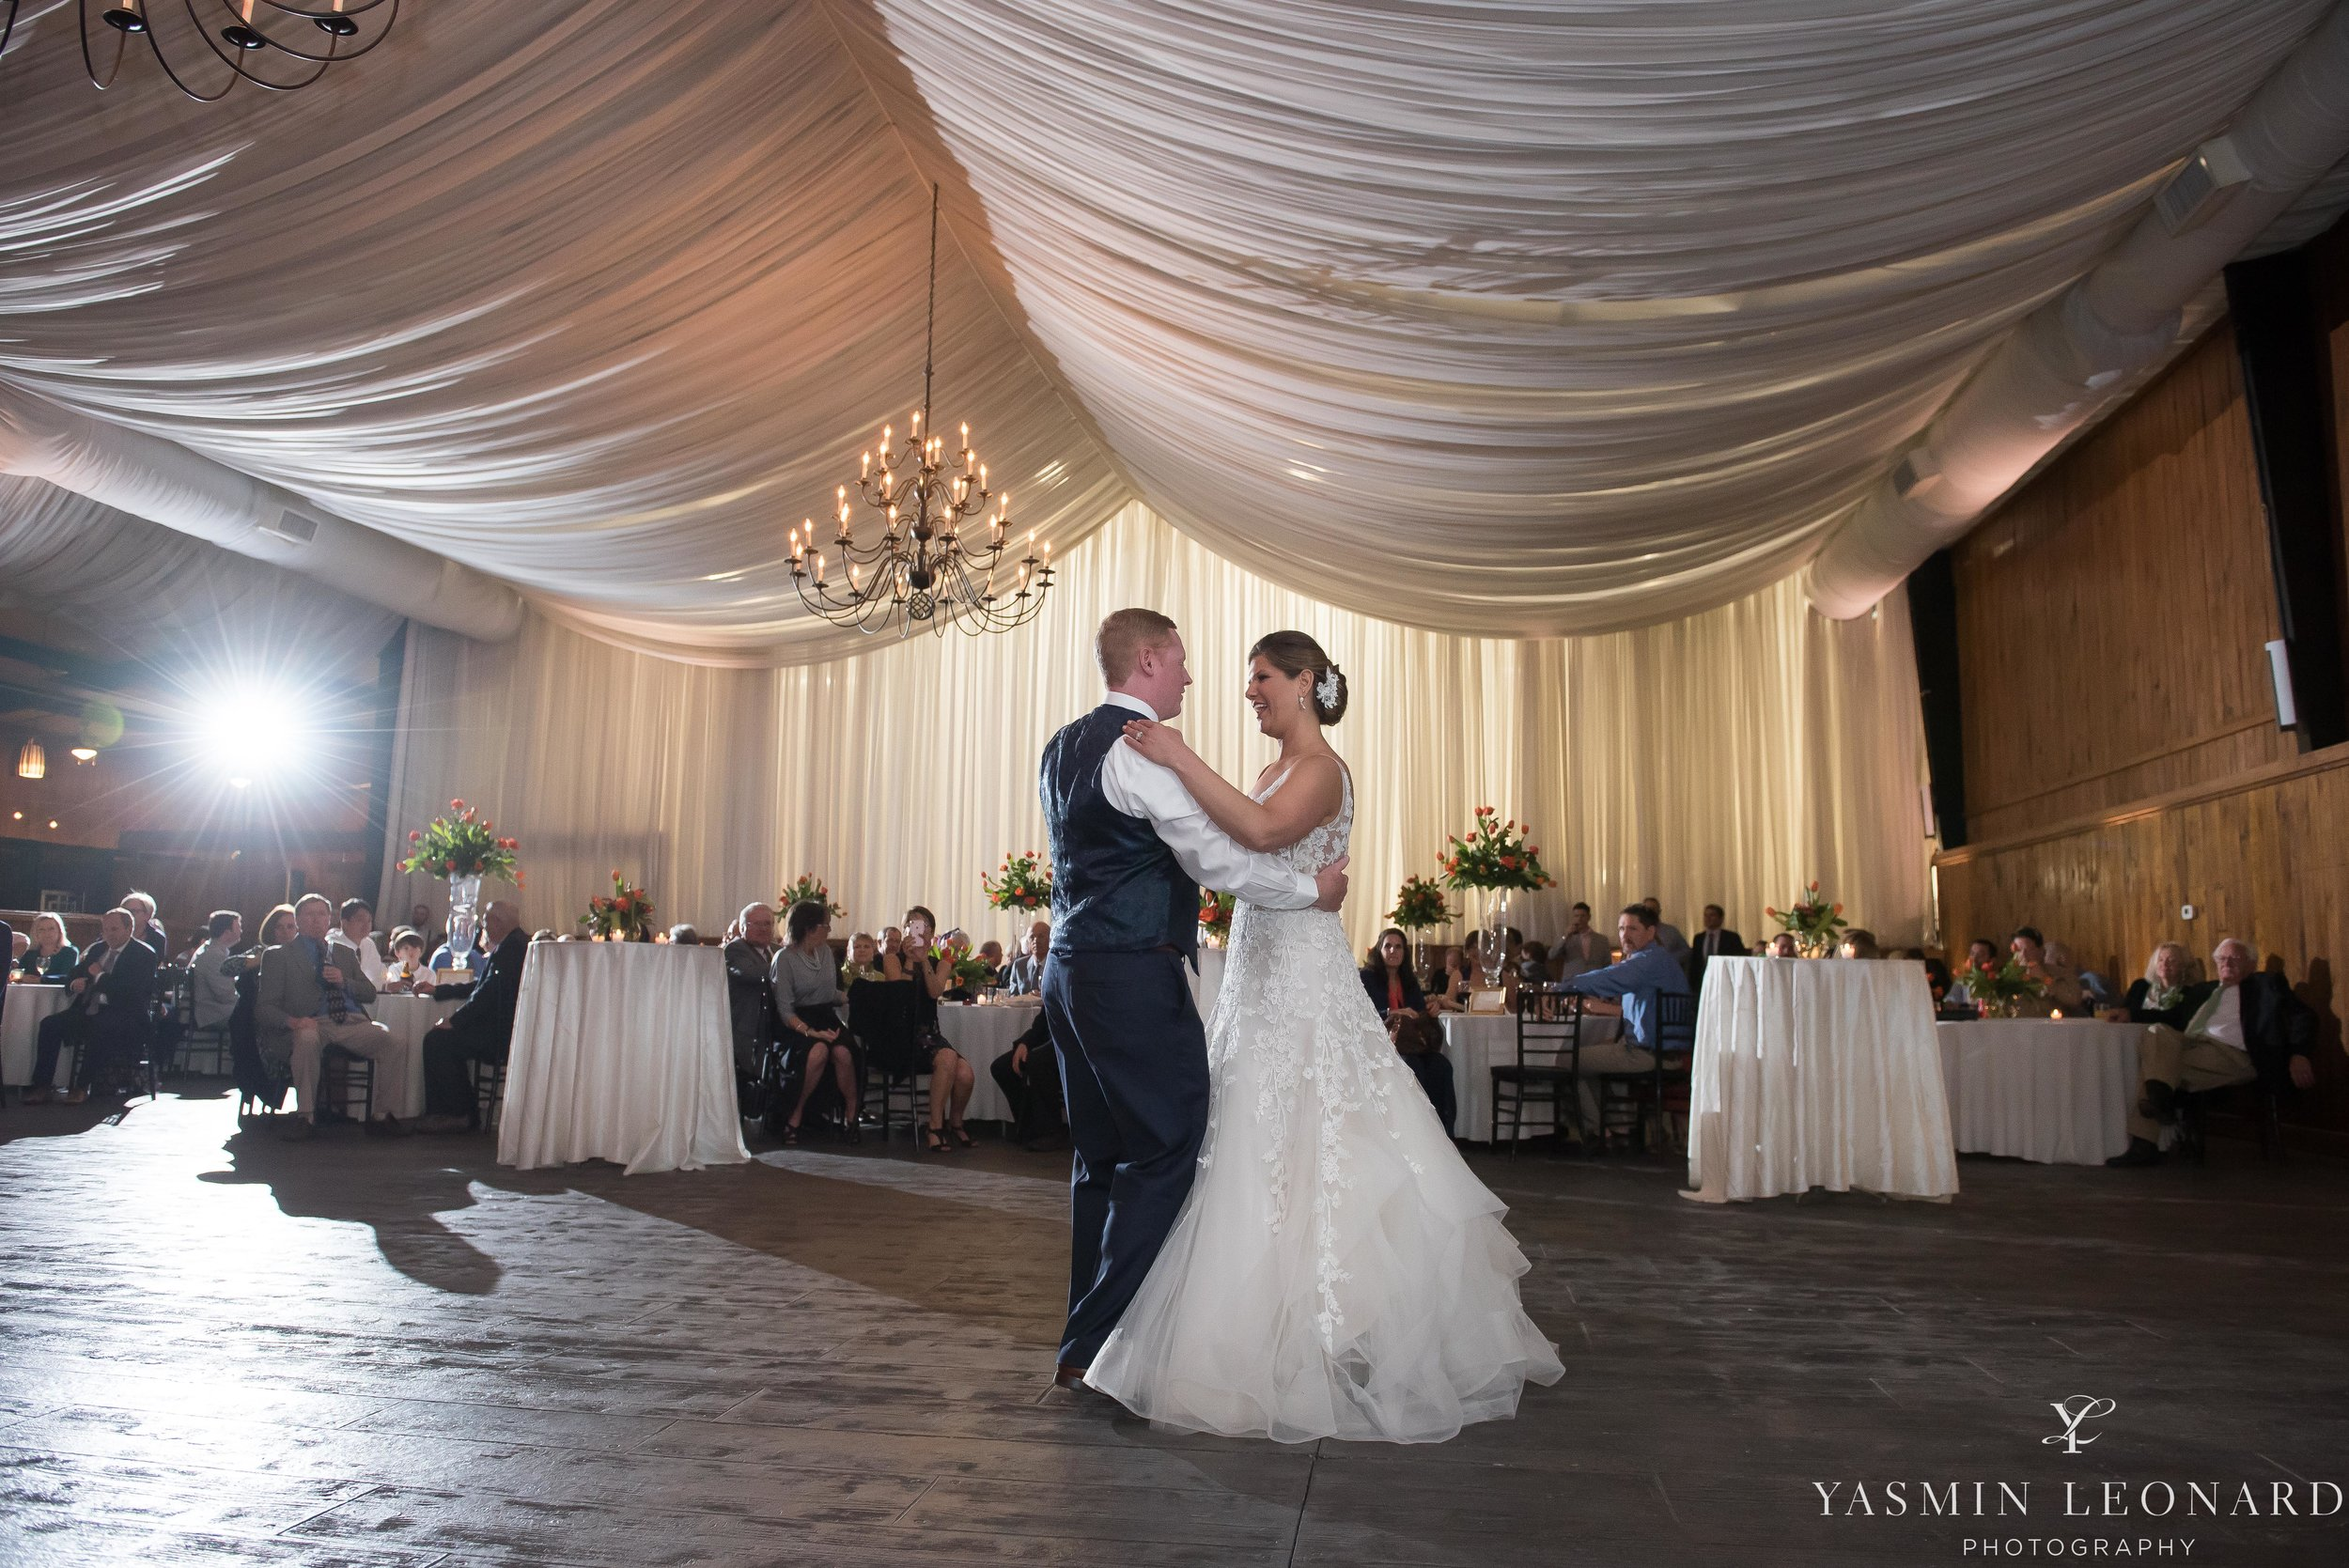 Adaumont Farm - Adaumont Farm Weddings - Trinity Weddings - NC Weddings - Yasmin Leonard Photography-60.jpg